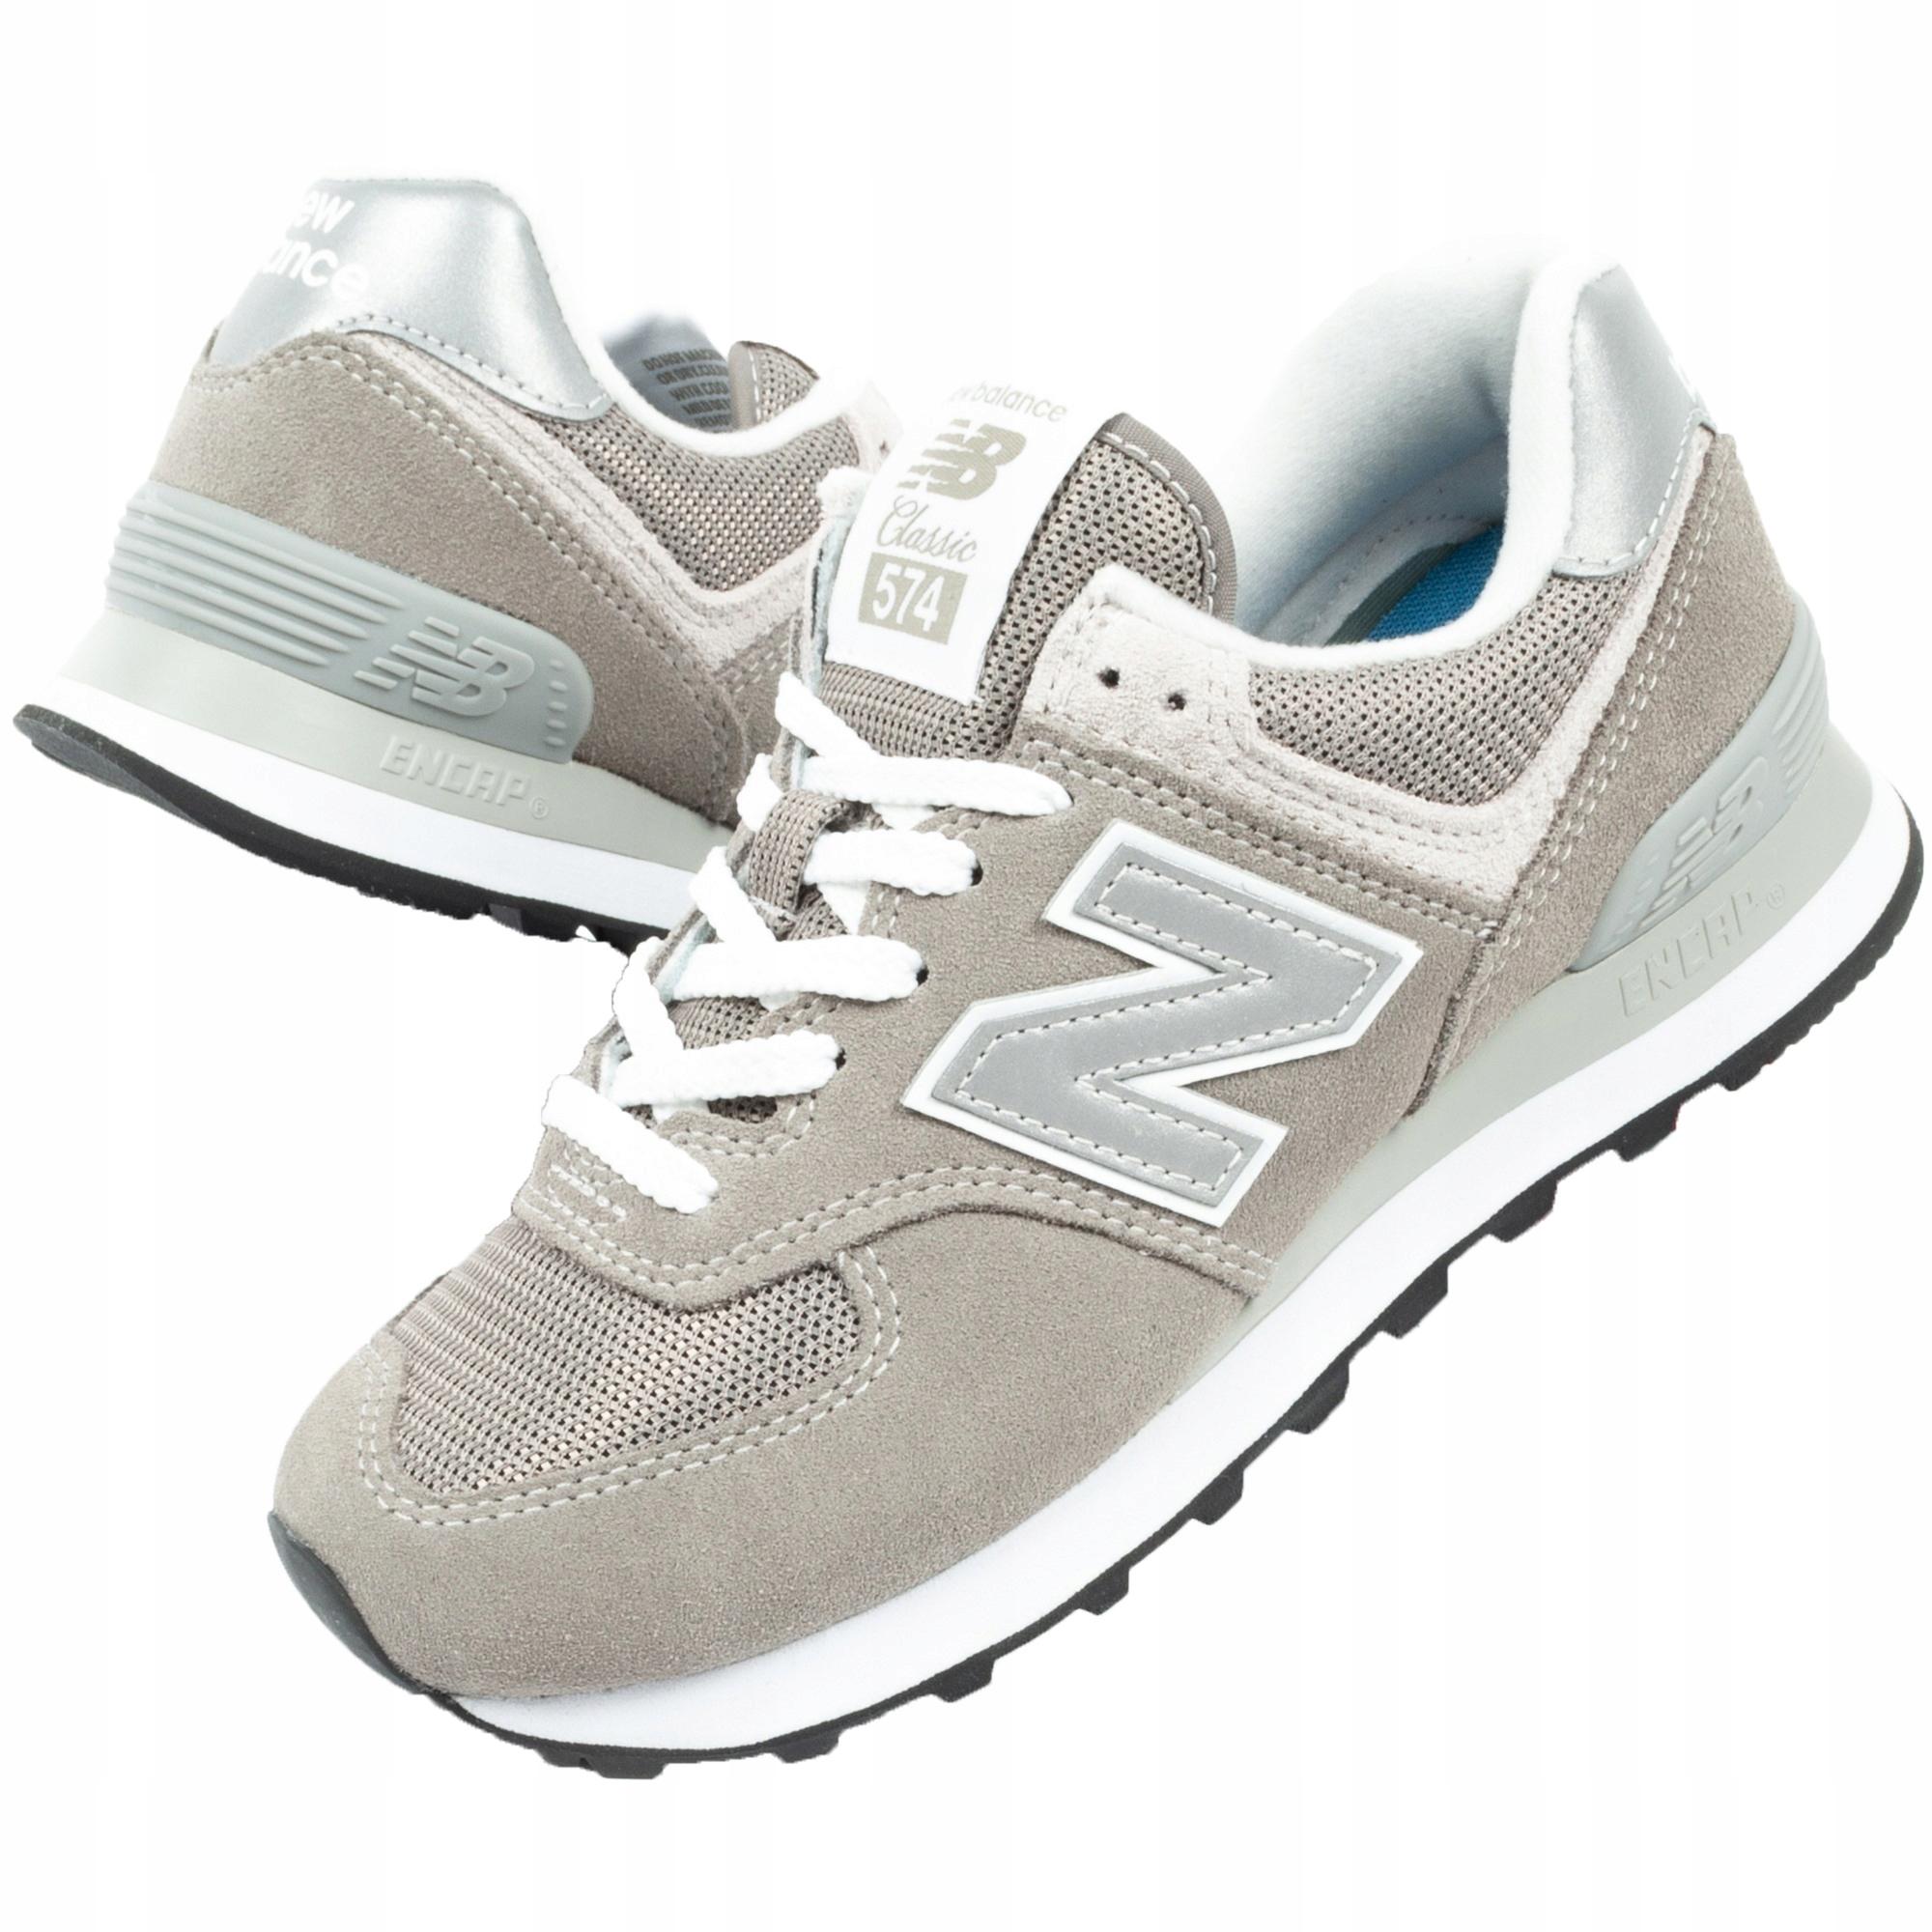 BUTY damskie NEW BALANCE 574 sneakers WL574EG 41,5